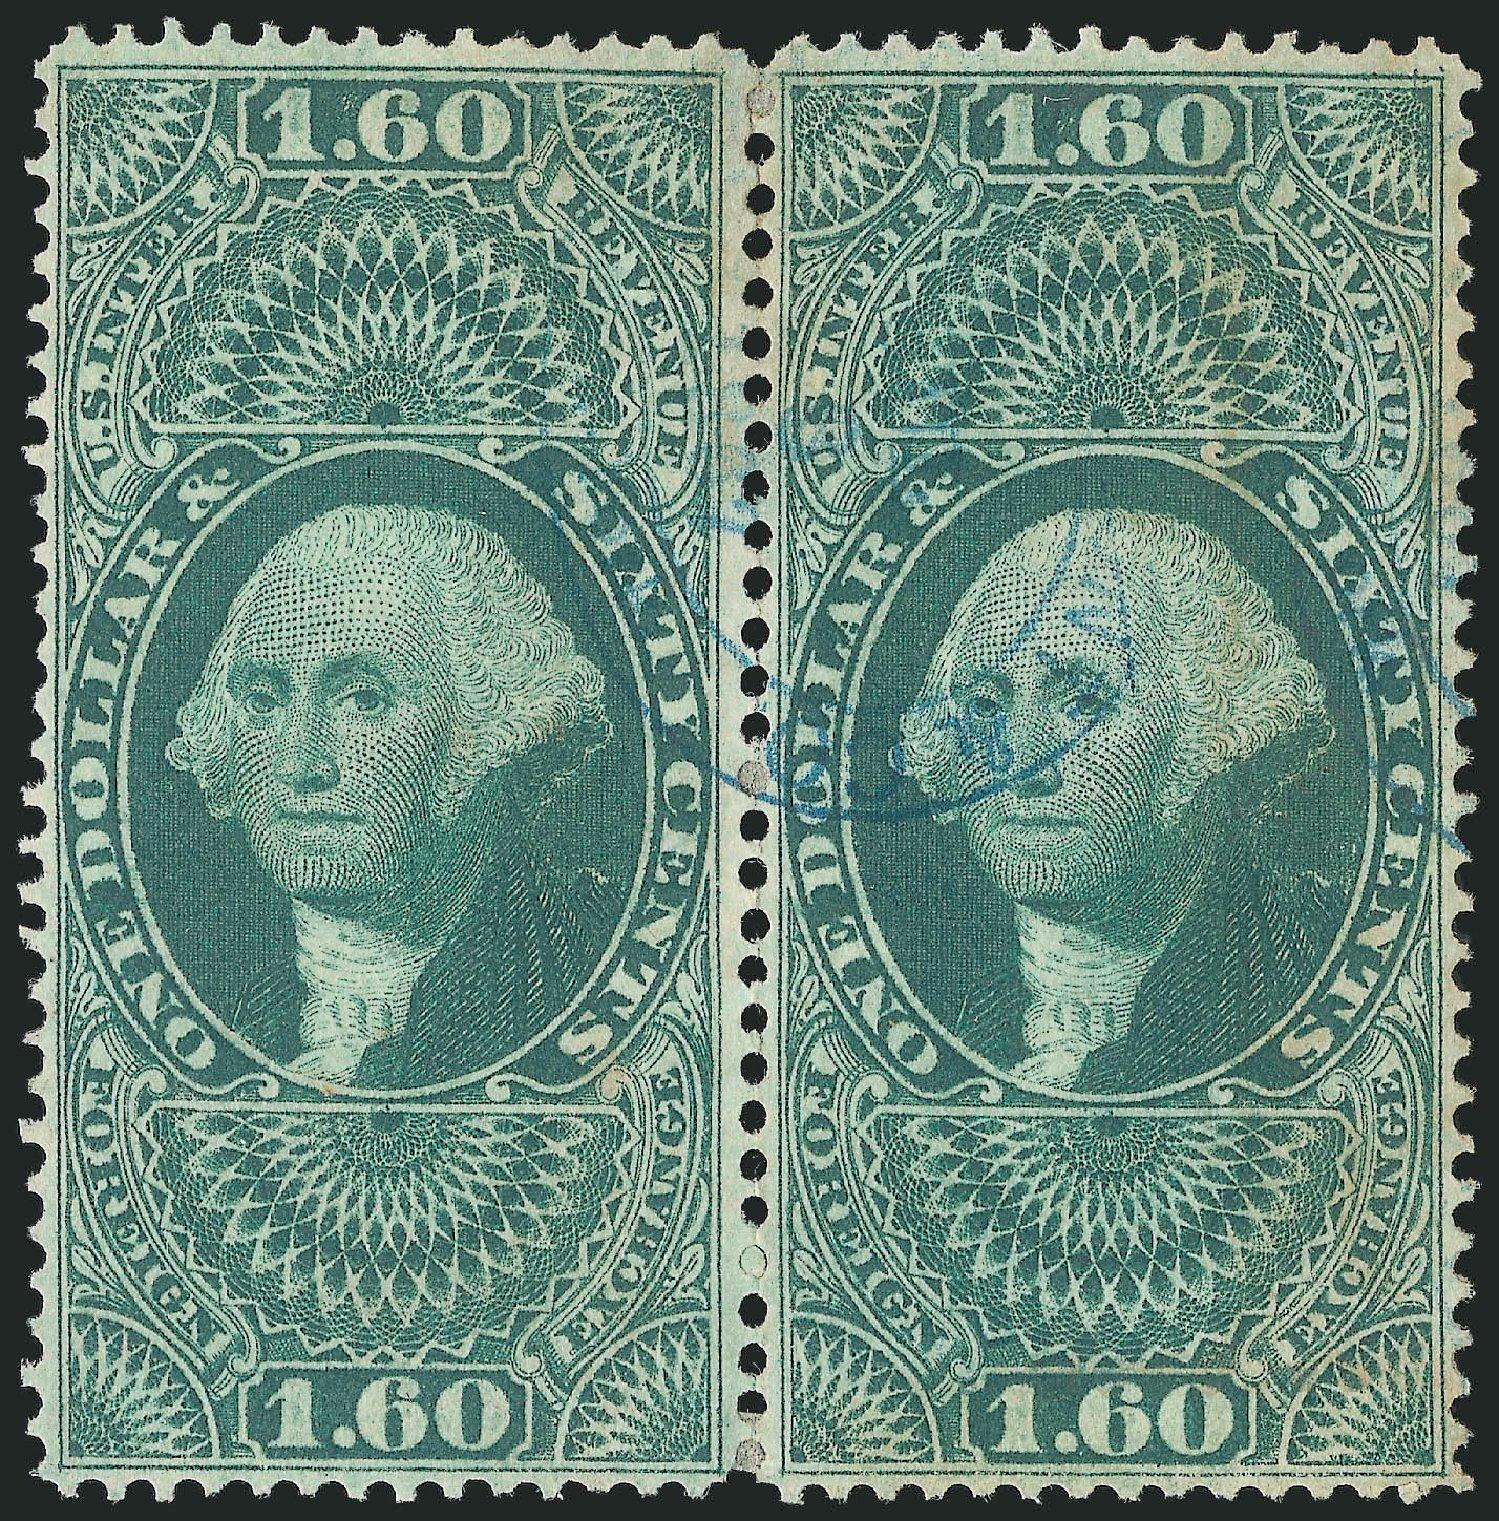 US Stamp Price Scott Catalogue R79 - US$1.60 1863 Revenue Foreign Exchange. Robert Siegel Auction Galleries, Dec 2014, Sale 1089, Lot 431